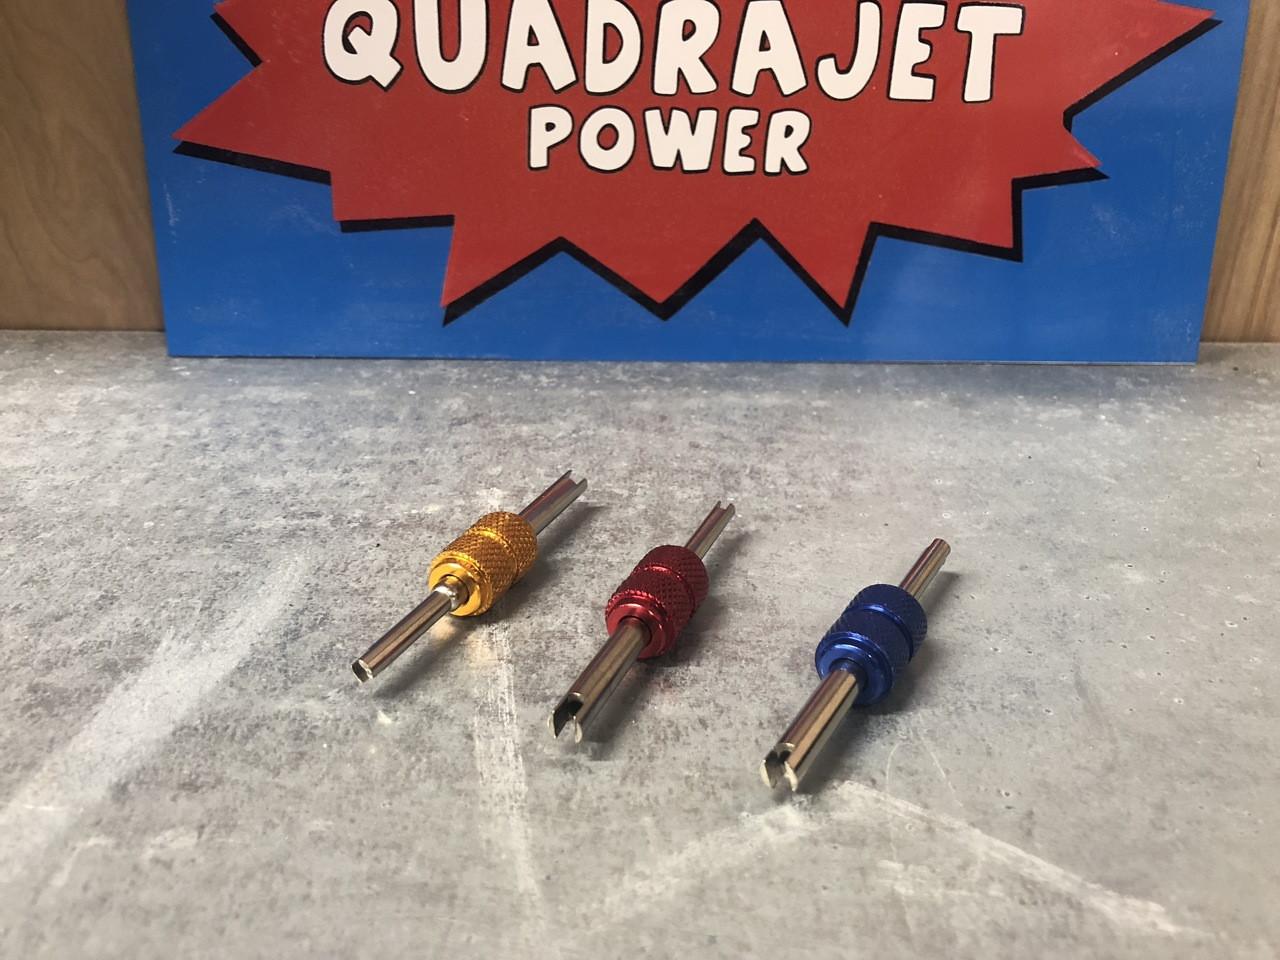 Apt Adjustment Tool 2 Sides For Both Types Screws Quadrajet Power Aircraft Float Type Carburetor Diagram